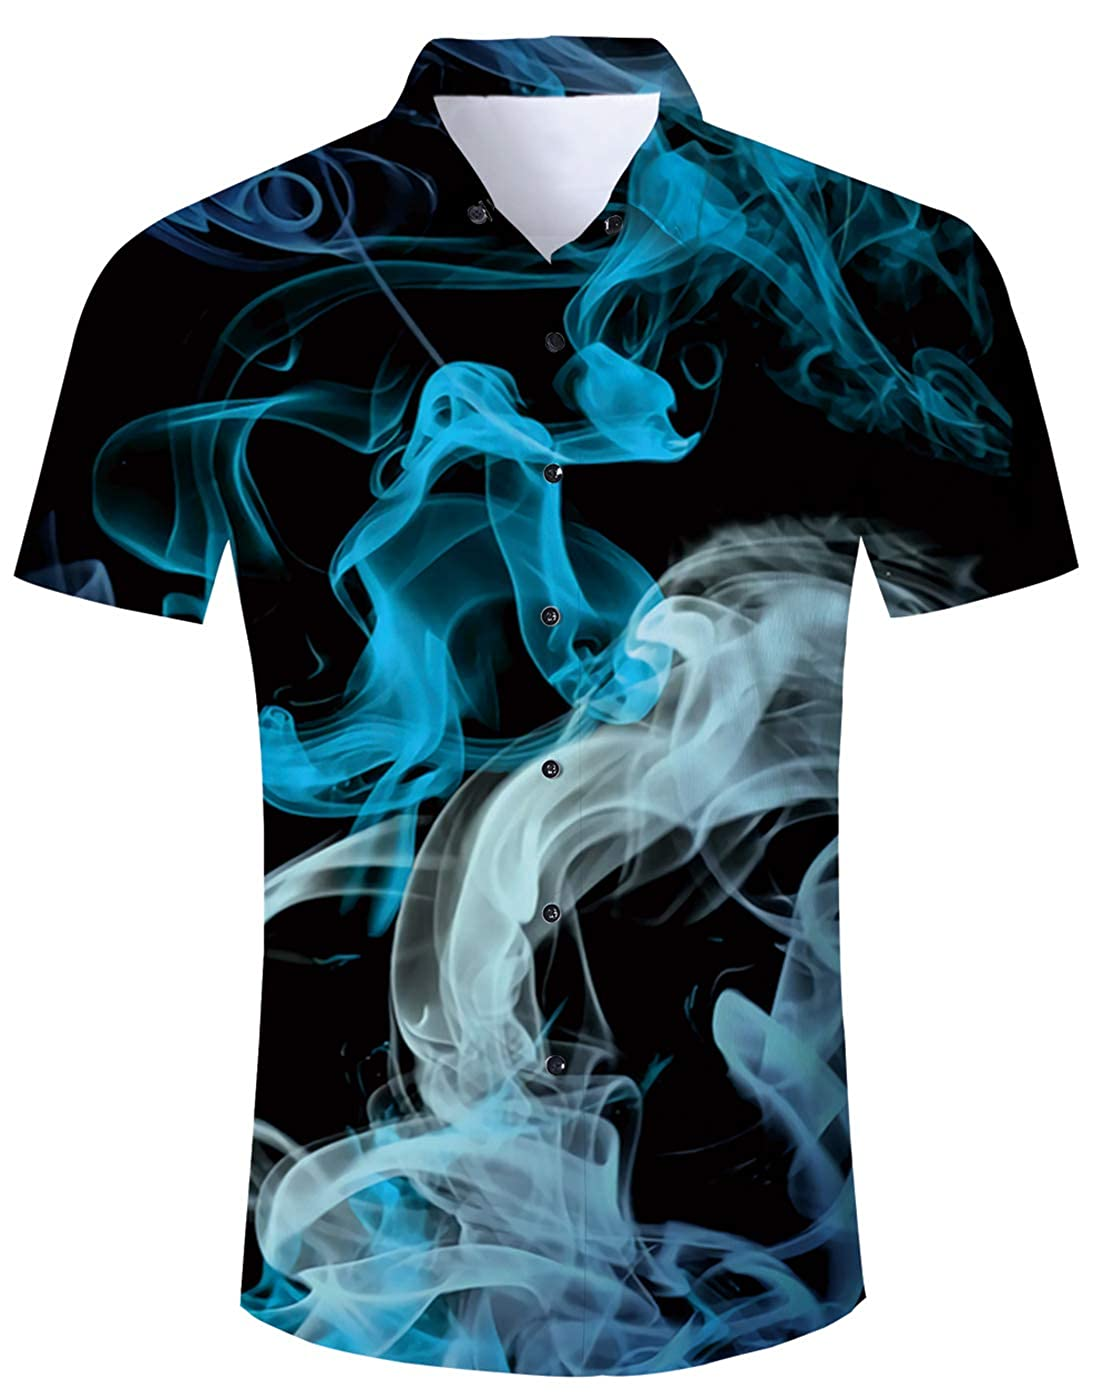 Idgreatim Herren Hawaiihemd 3D Gedruckt Muster Kurzarm Aloha Freizeit Hemd Button Down Graphic Hemden Shirts